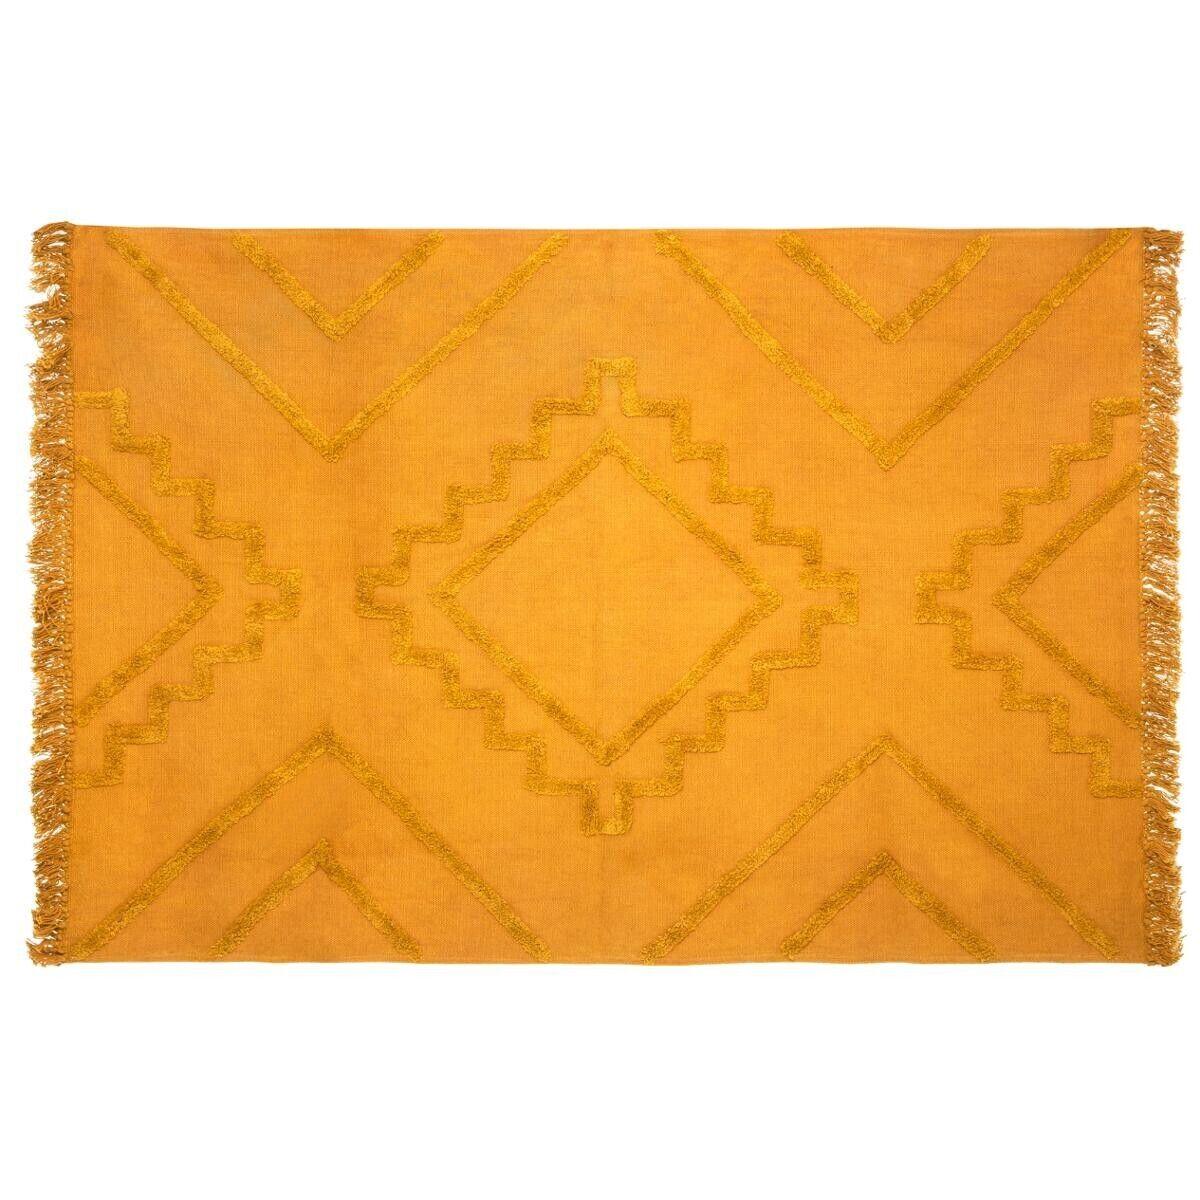 "Atmosphera Tapis en coton tufté ""Inca"" moutarde 120x170 cm"